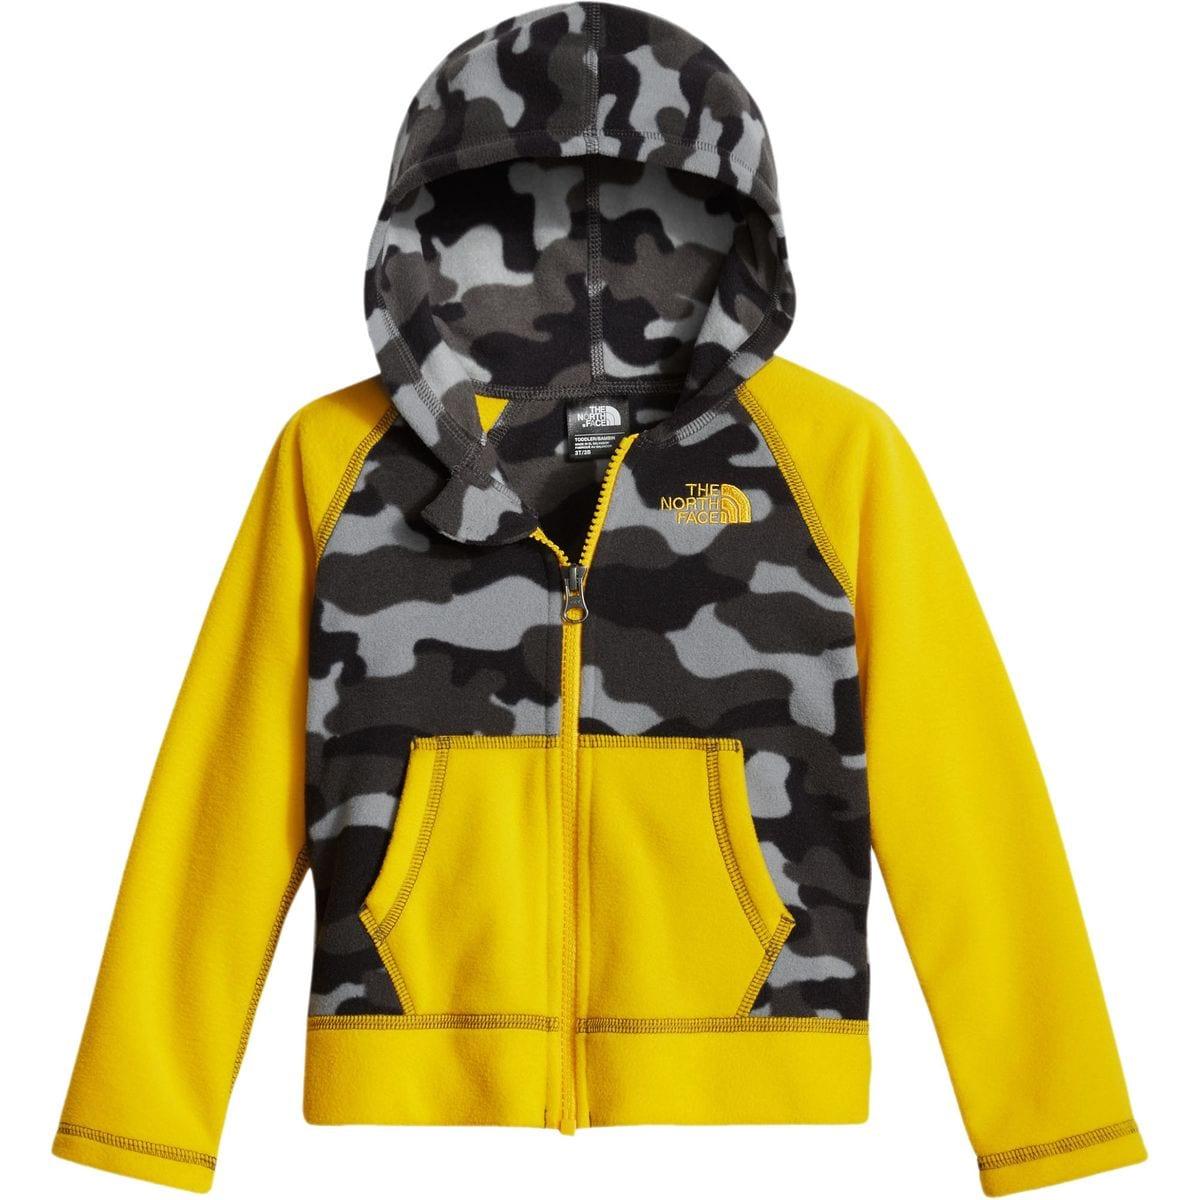 The North Face Glacier Hooded Fleece Jacket - Toddler Boys